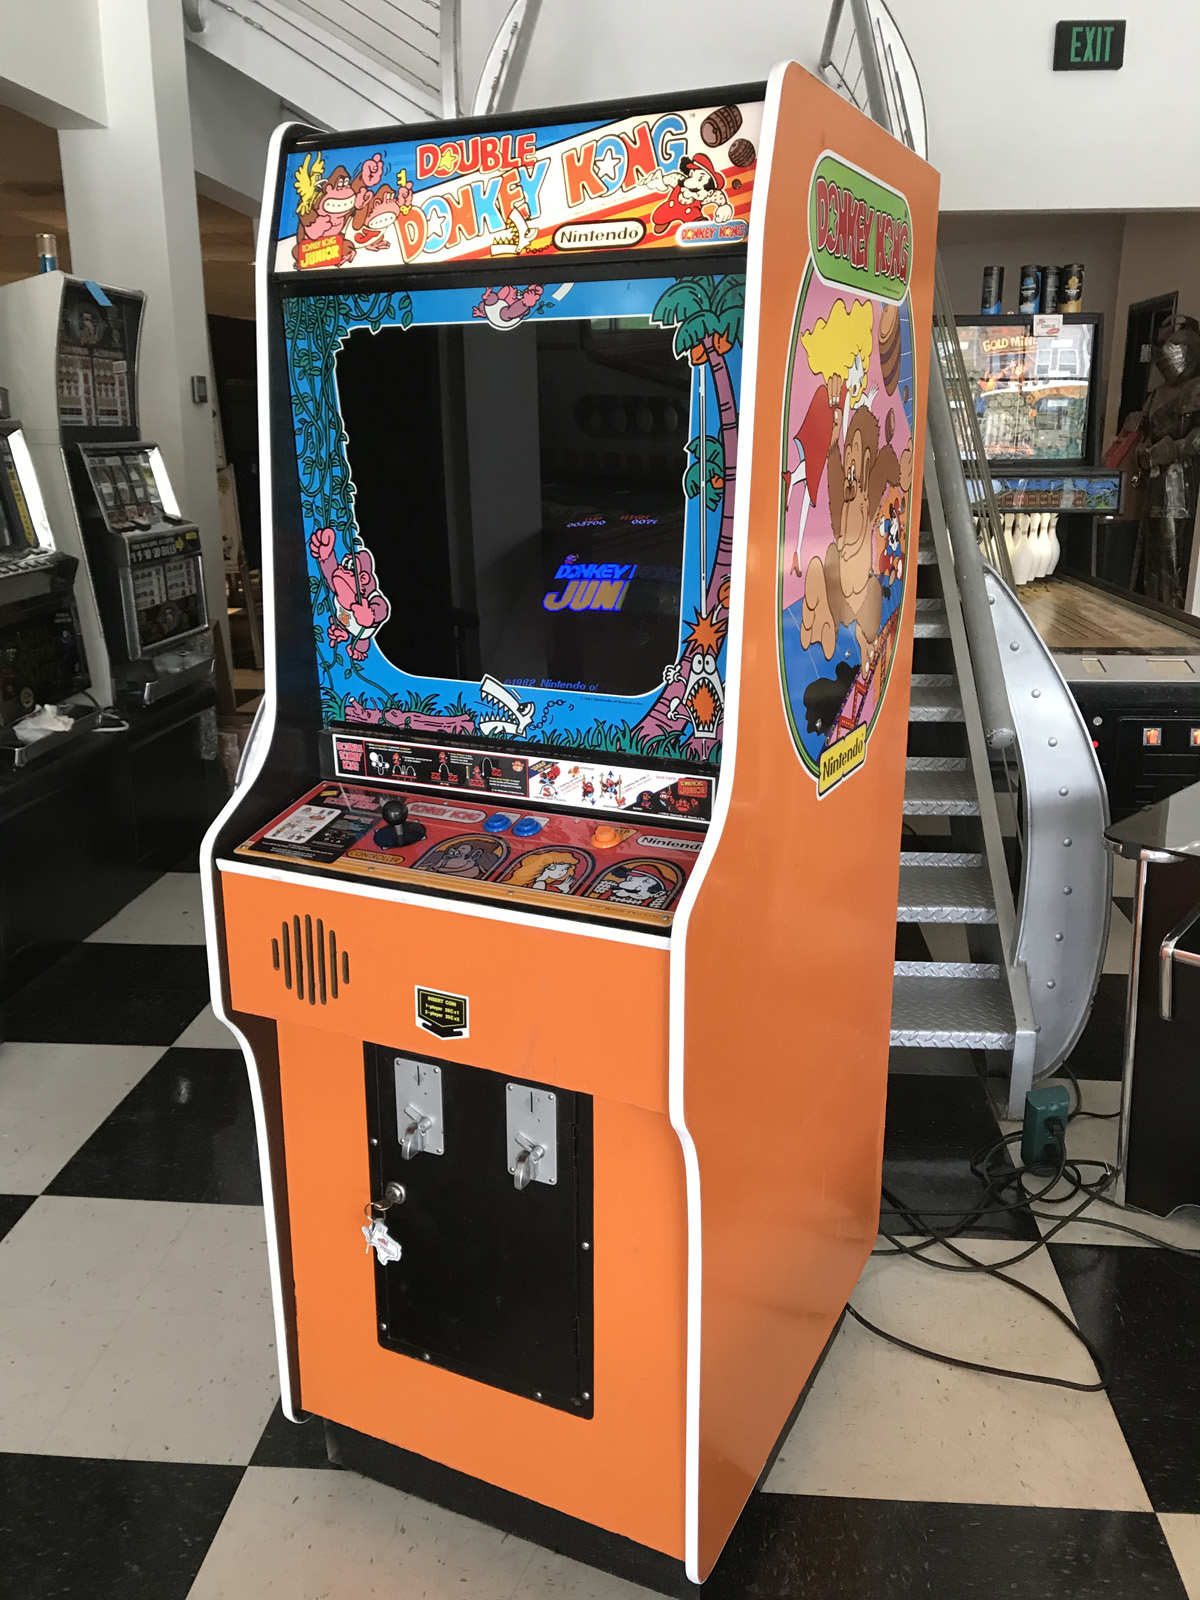 Double Donkey Kong Arcade Game Fun